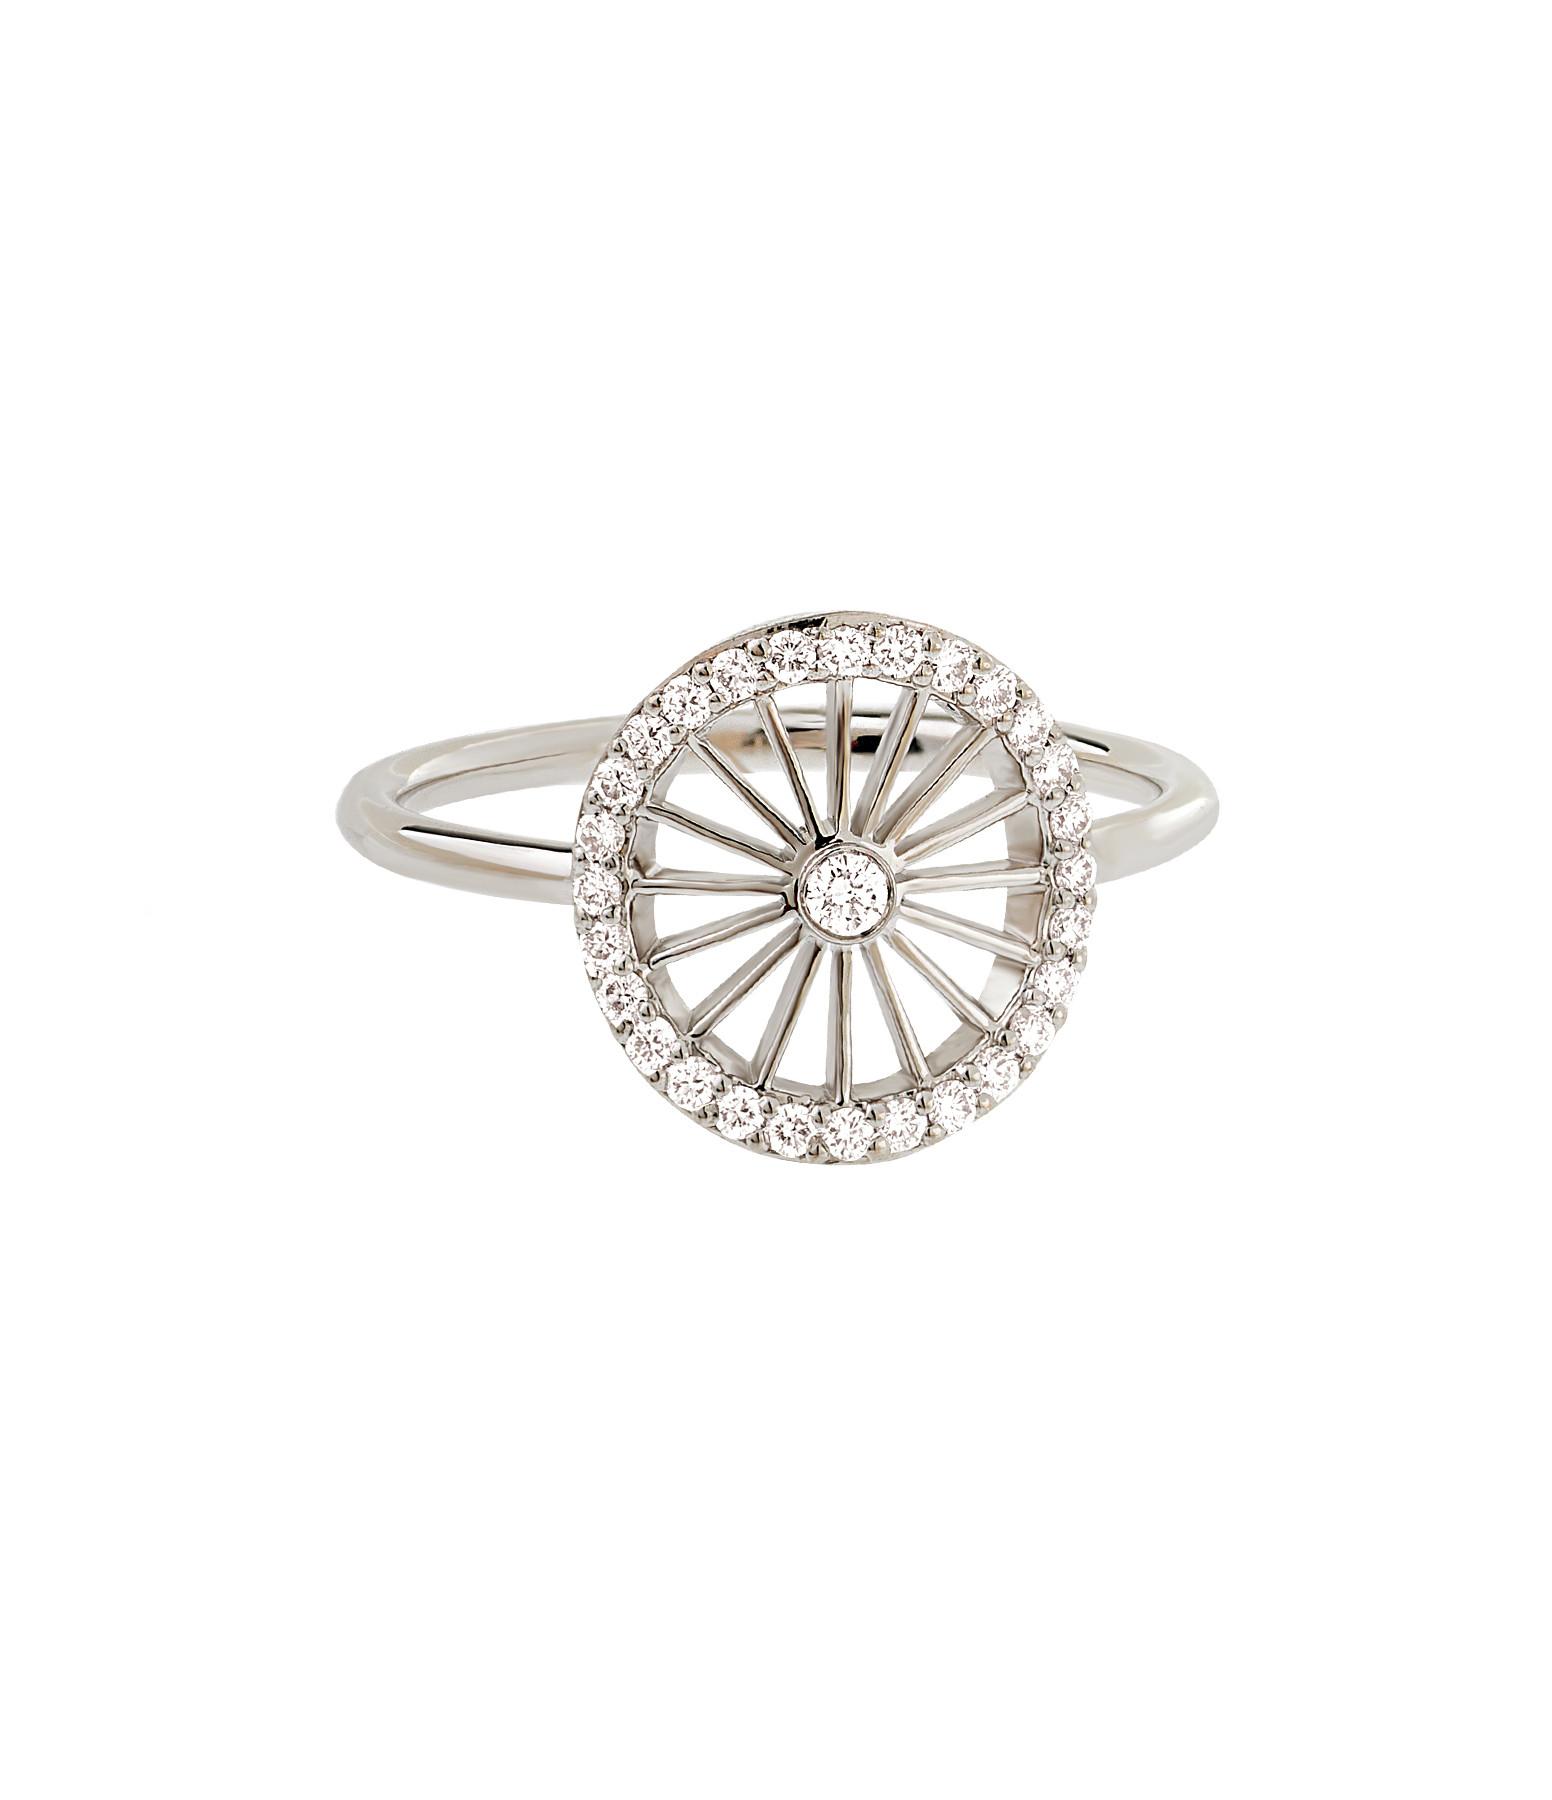 NAVA JOAILLERIE - Bague Cheyenne Ronde Diamants Or Blanc